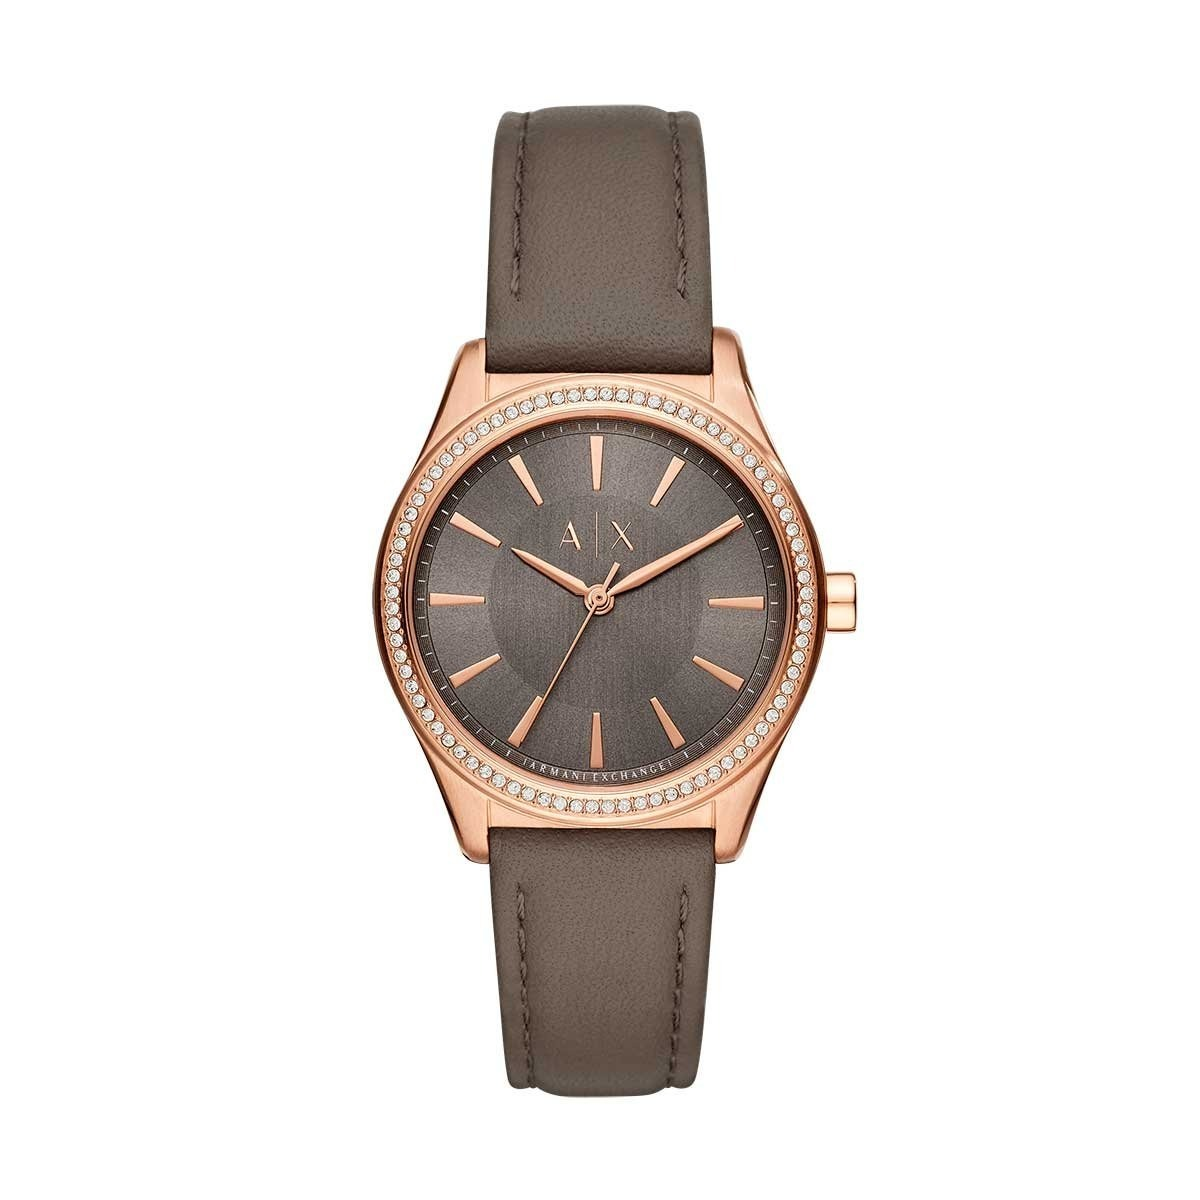 38c7e9115692 reloj para dama armani exchange ax5455 nicolette original. Cargando zoom.